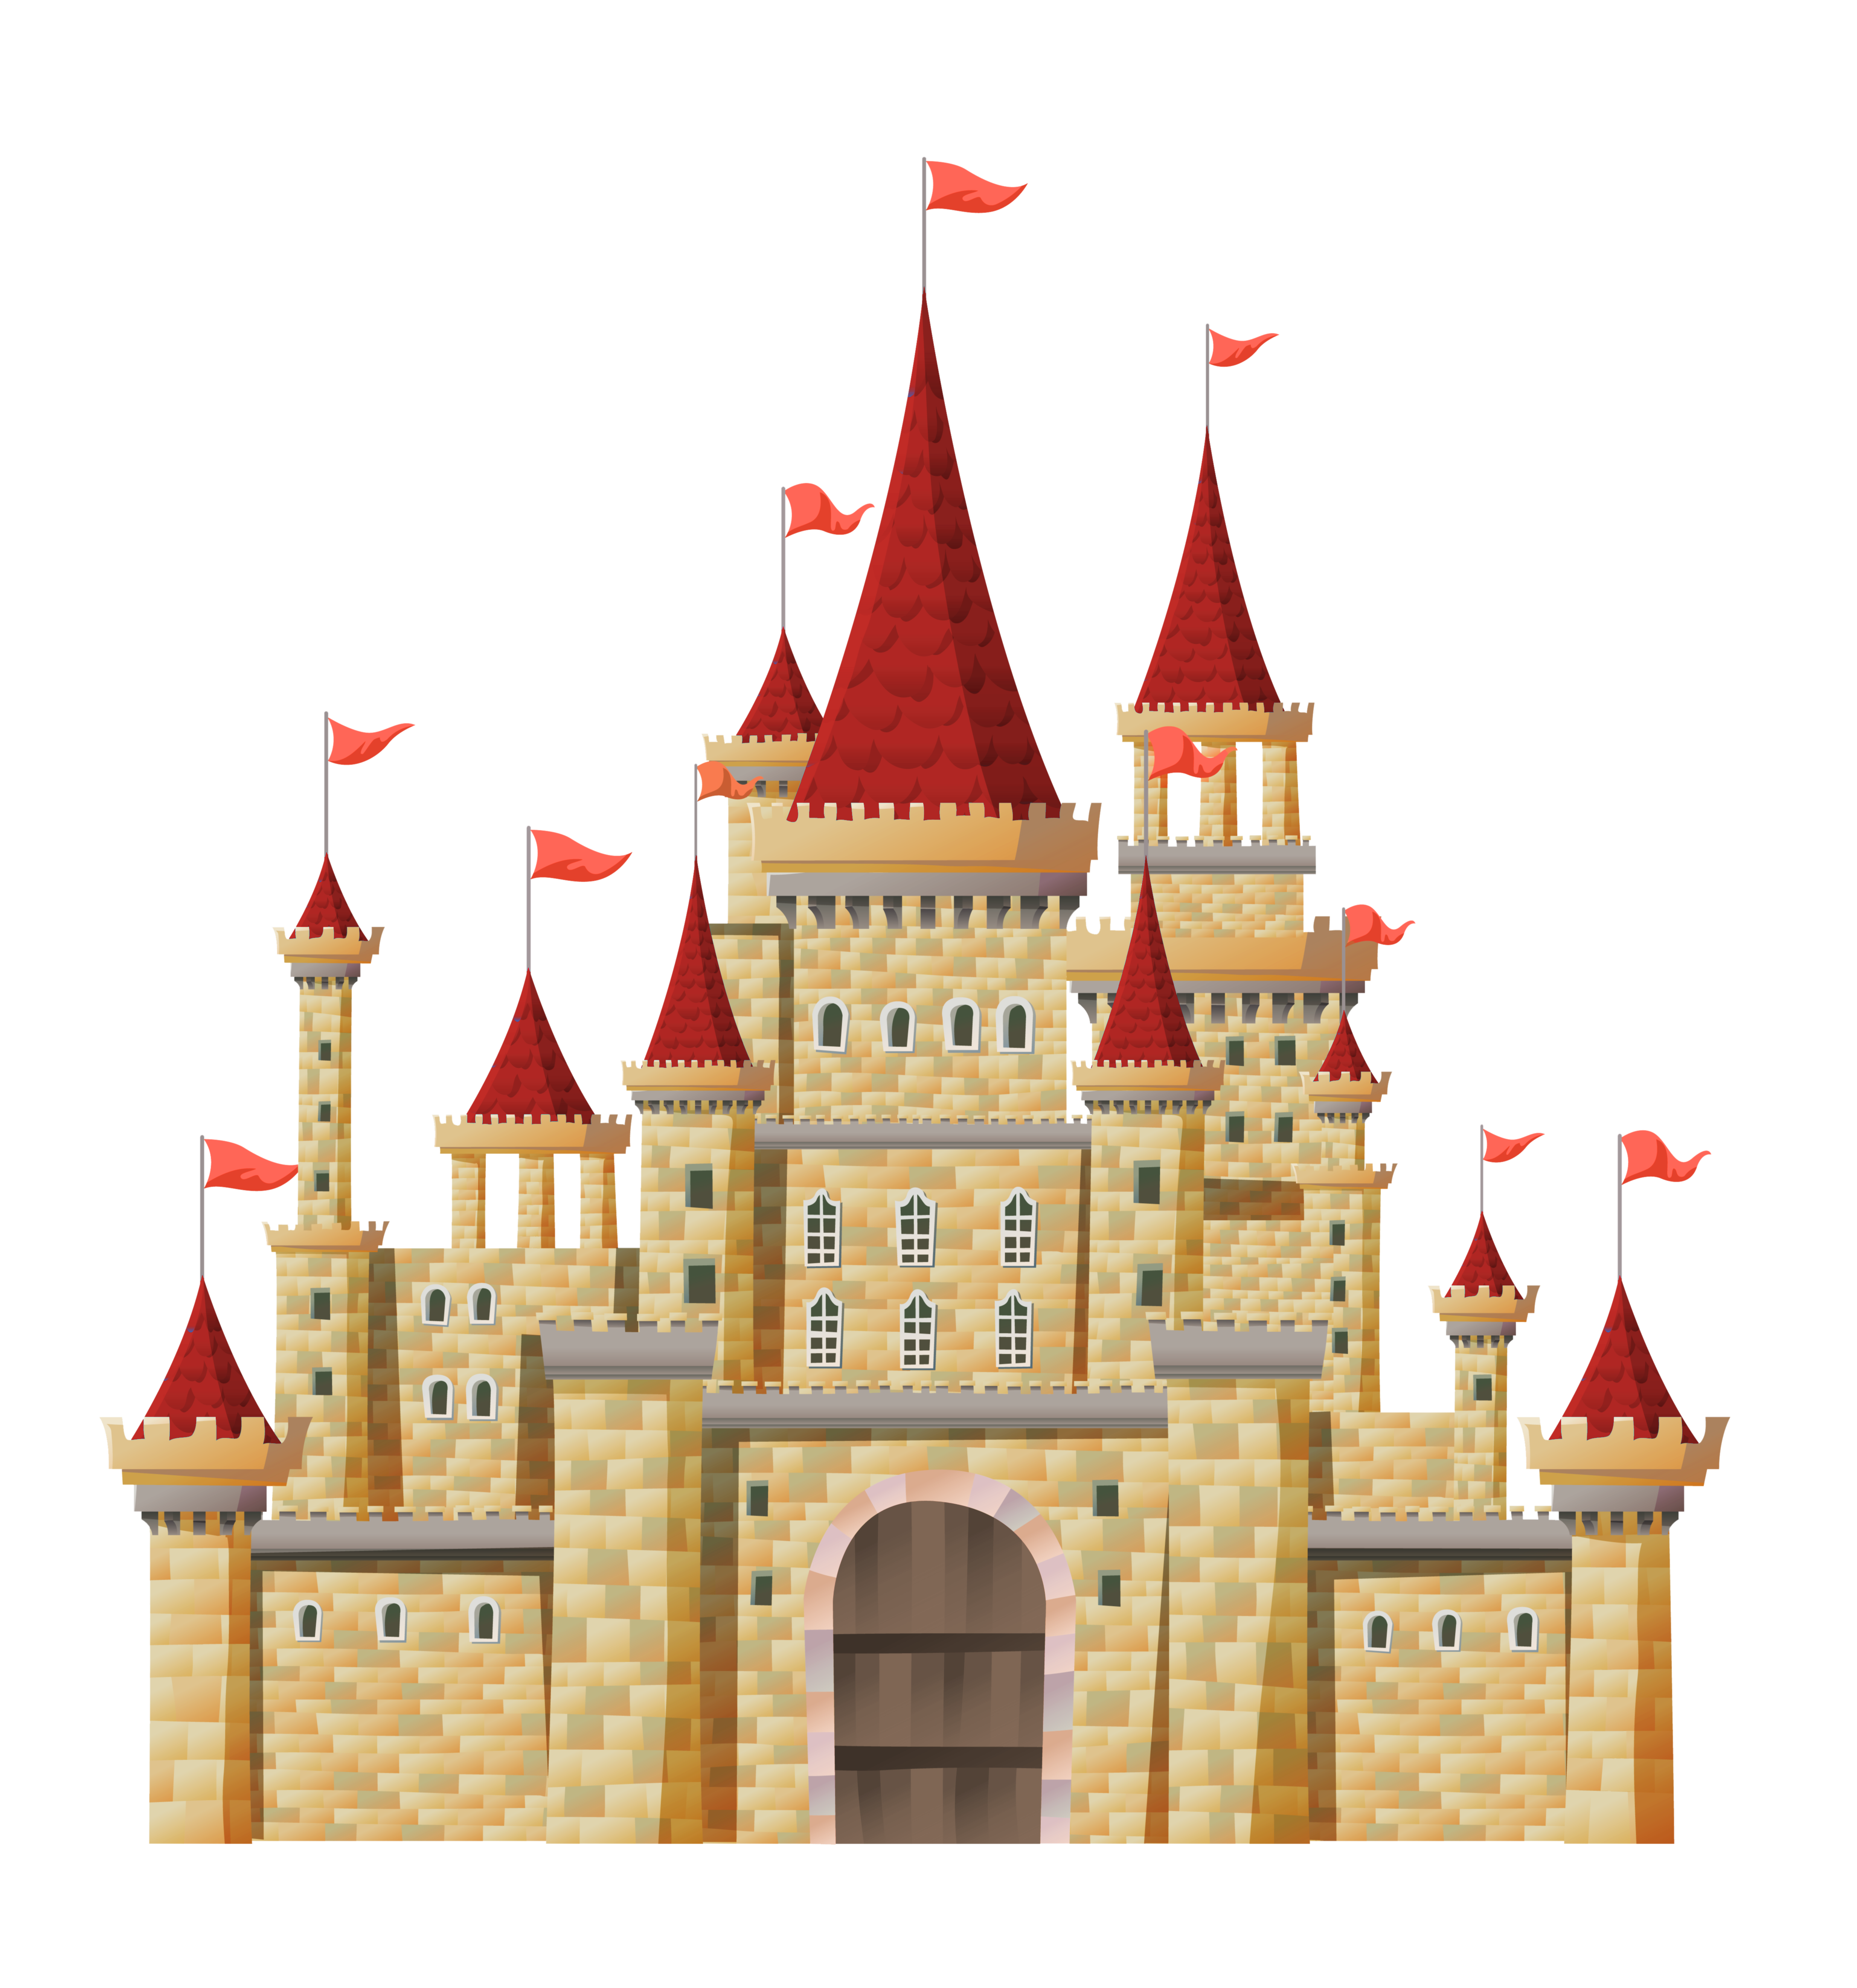 Clip art library . Palace clipart castle welsh